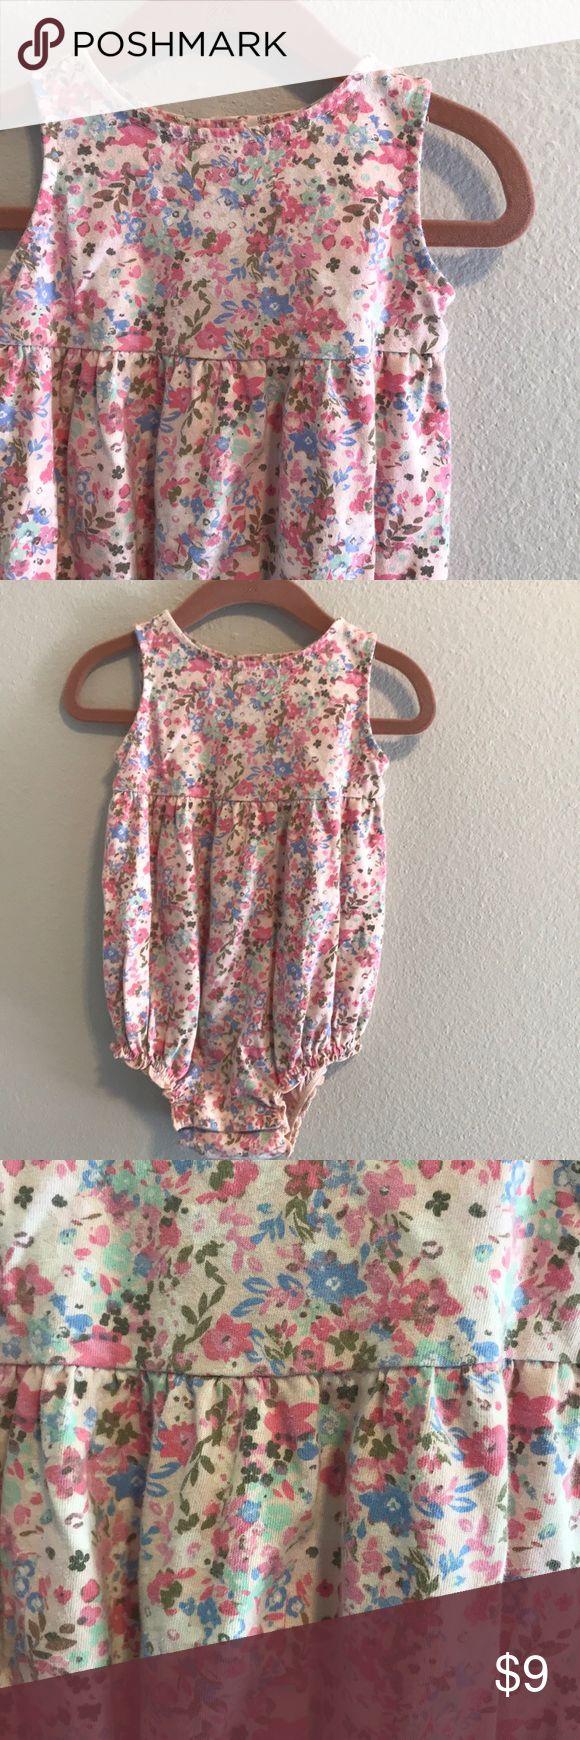 Old Navy 18-24 months floral onesie Adorable floral onesie! Old Navy One Pieces Bodysuits